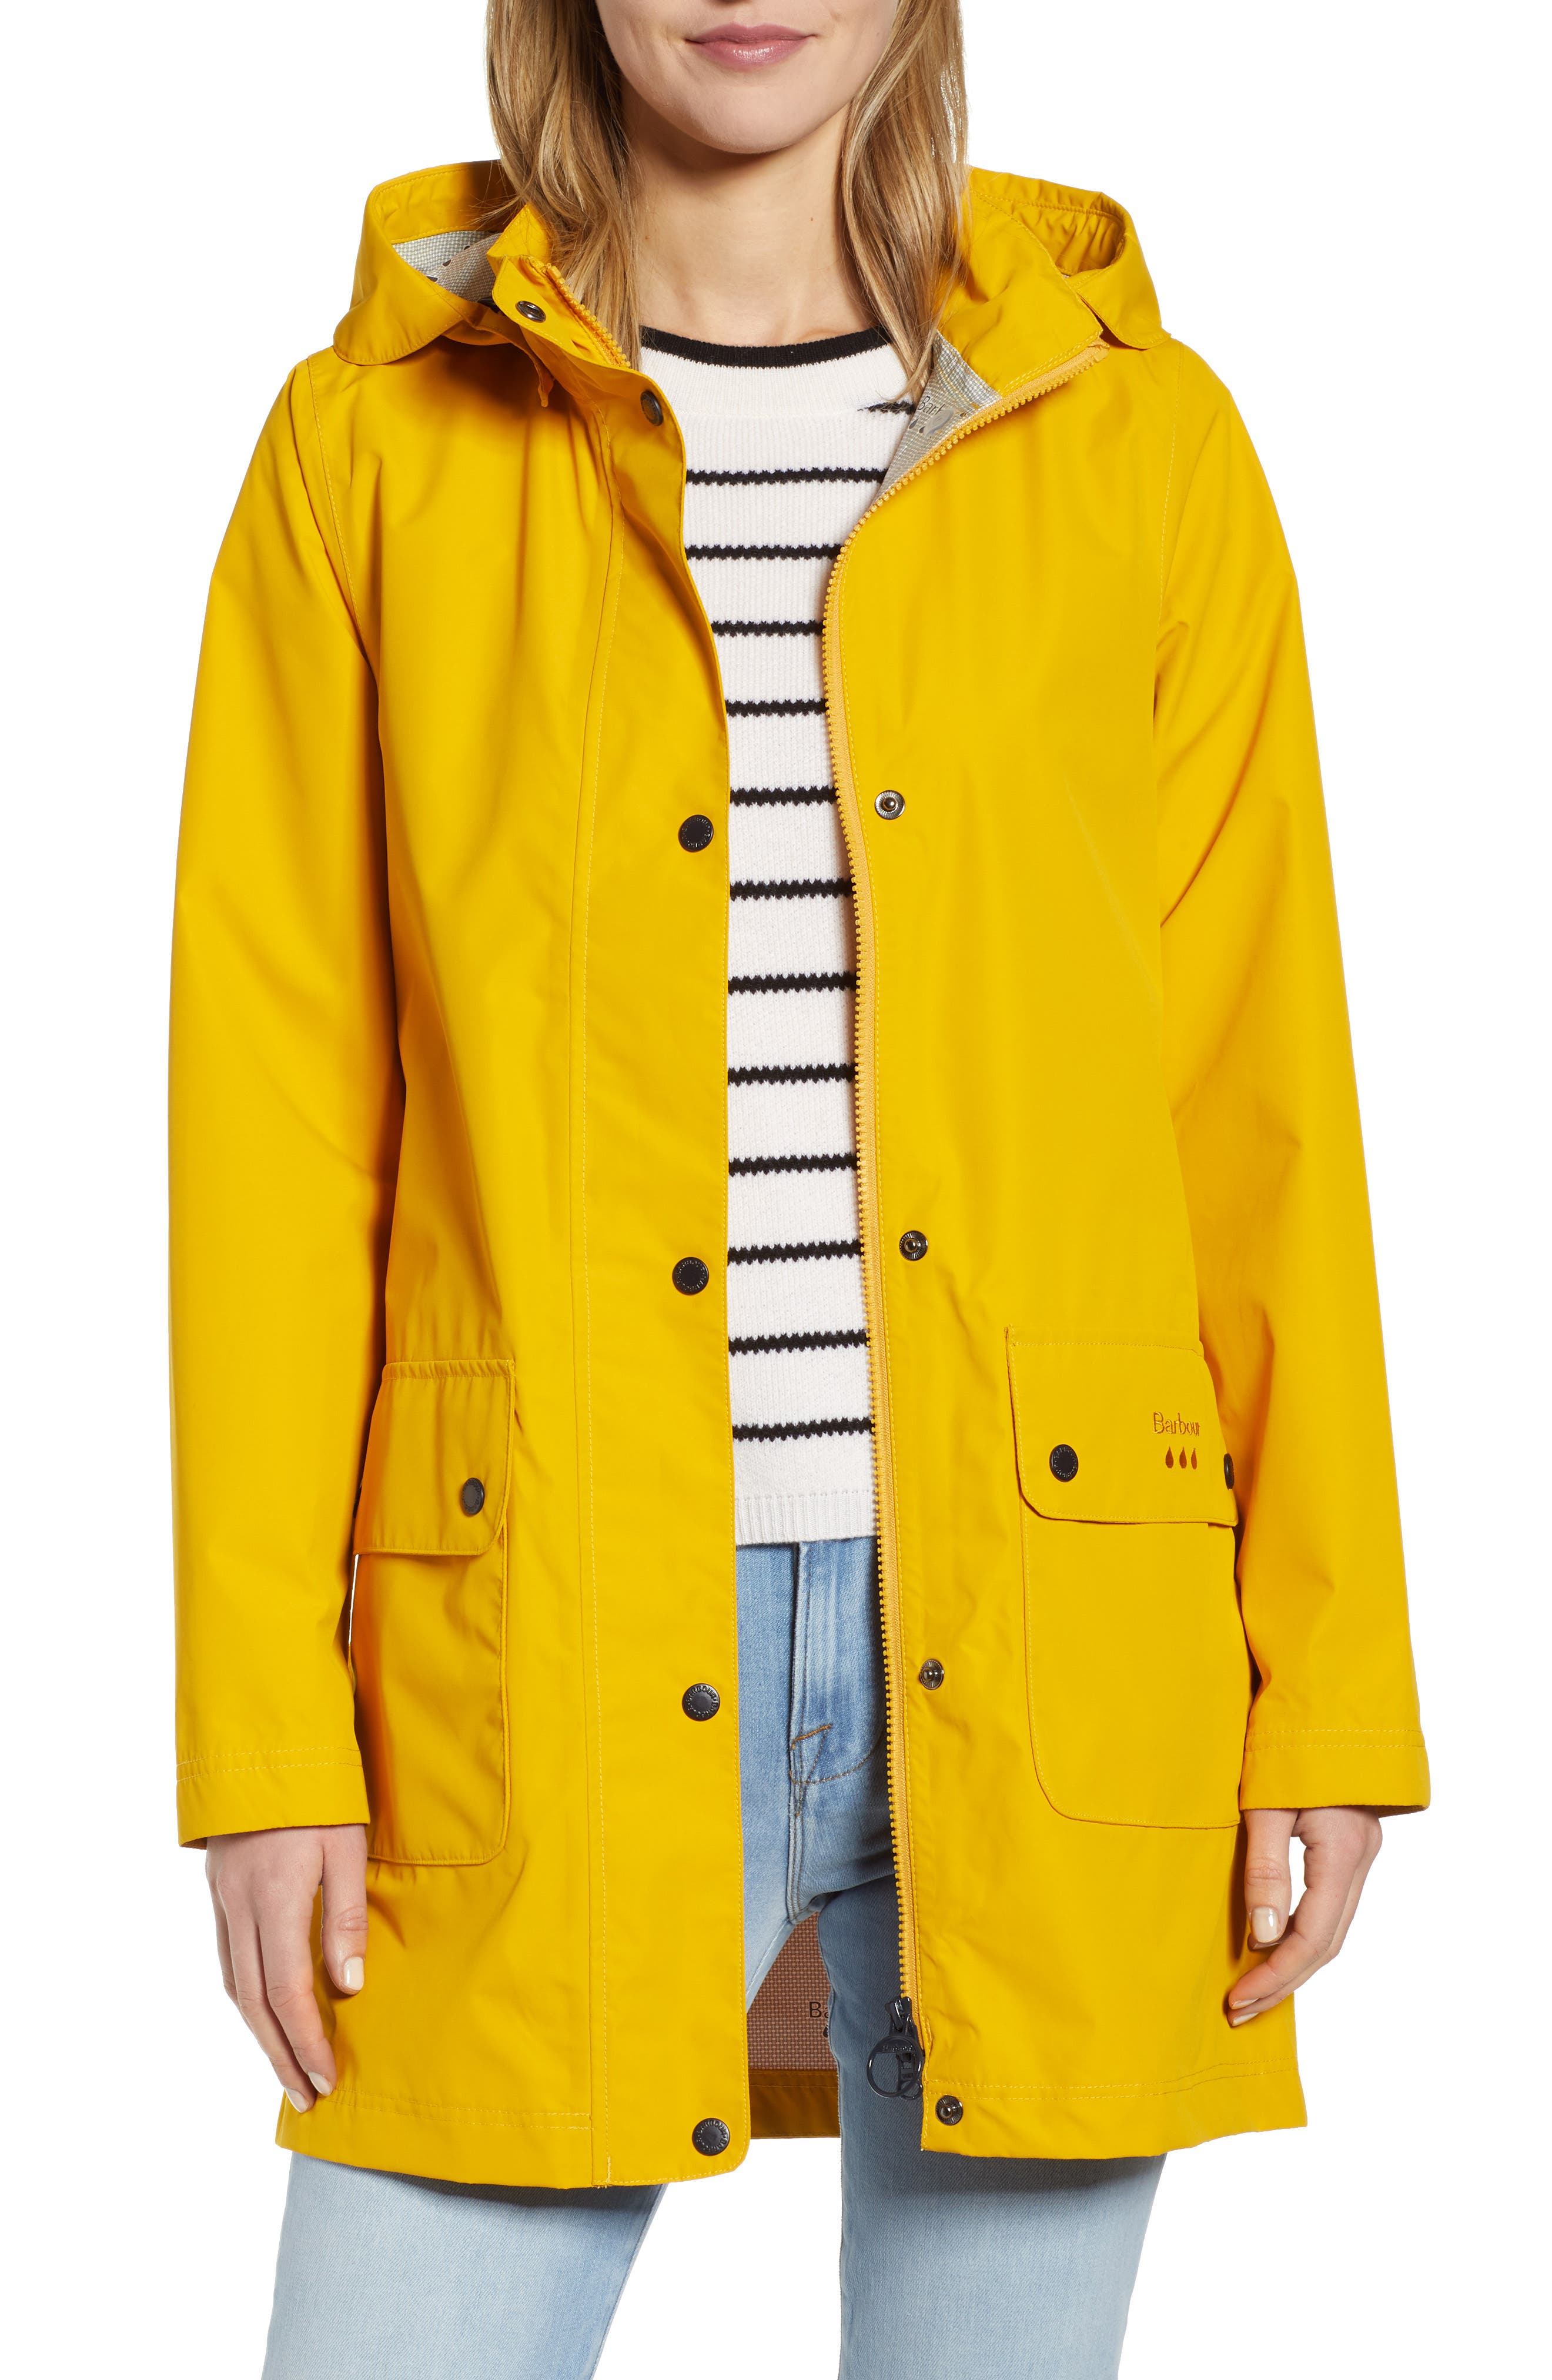 Barbour Inclement Waterproof Hooded Jacket, US / 8 UK - Yellow